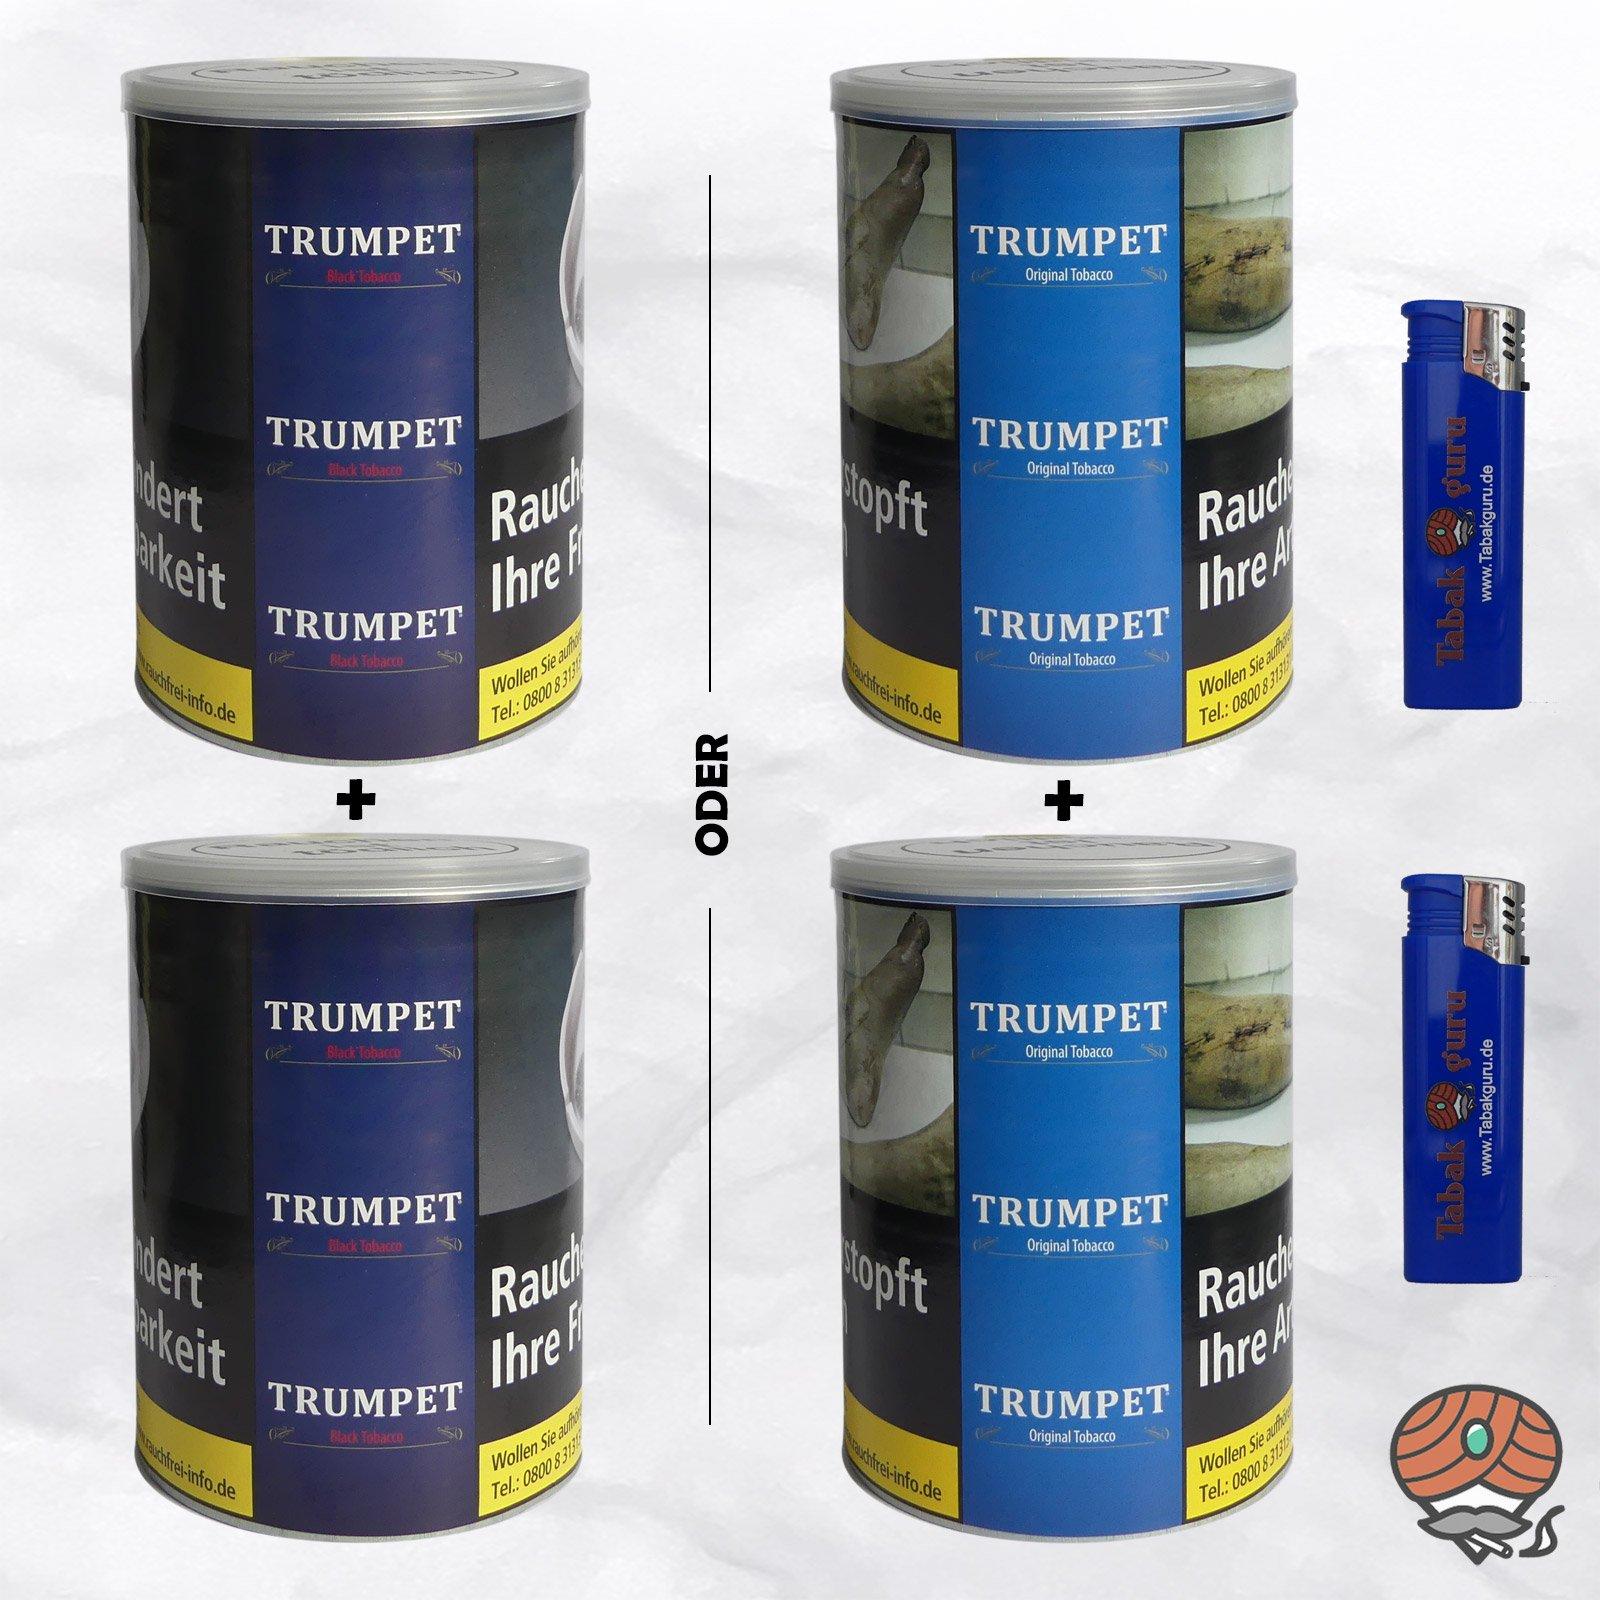 2 x Trumpet ORIGINAL oder BLACK Tobacco Drehtabak à 130 g Dose wählbar